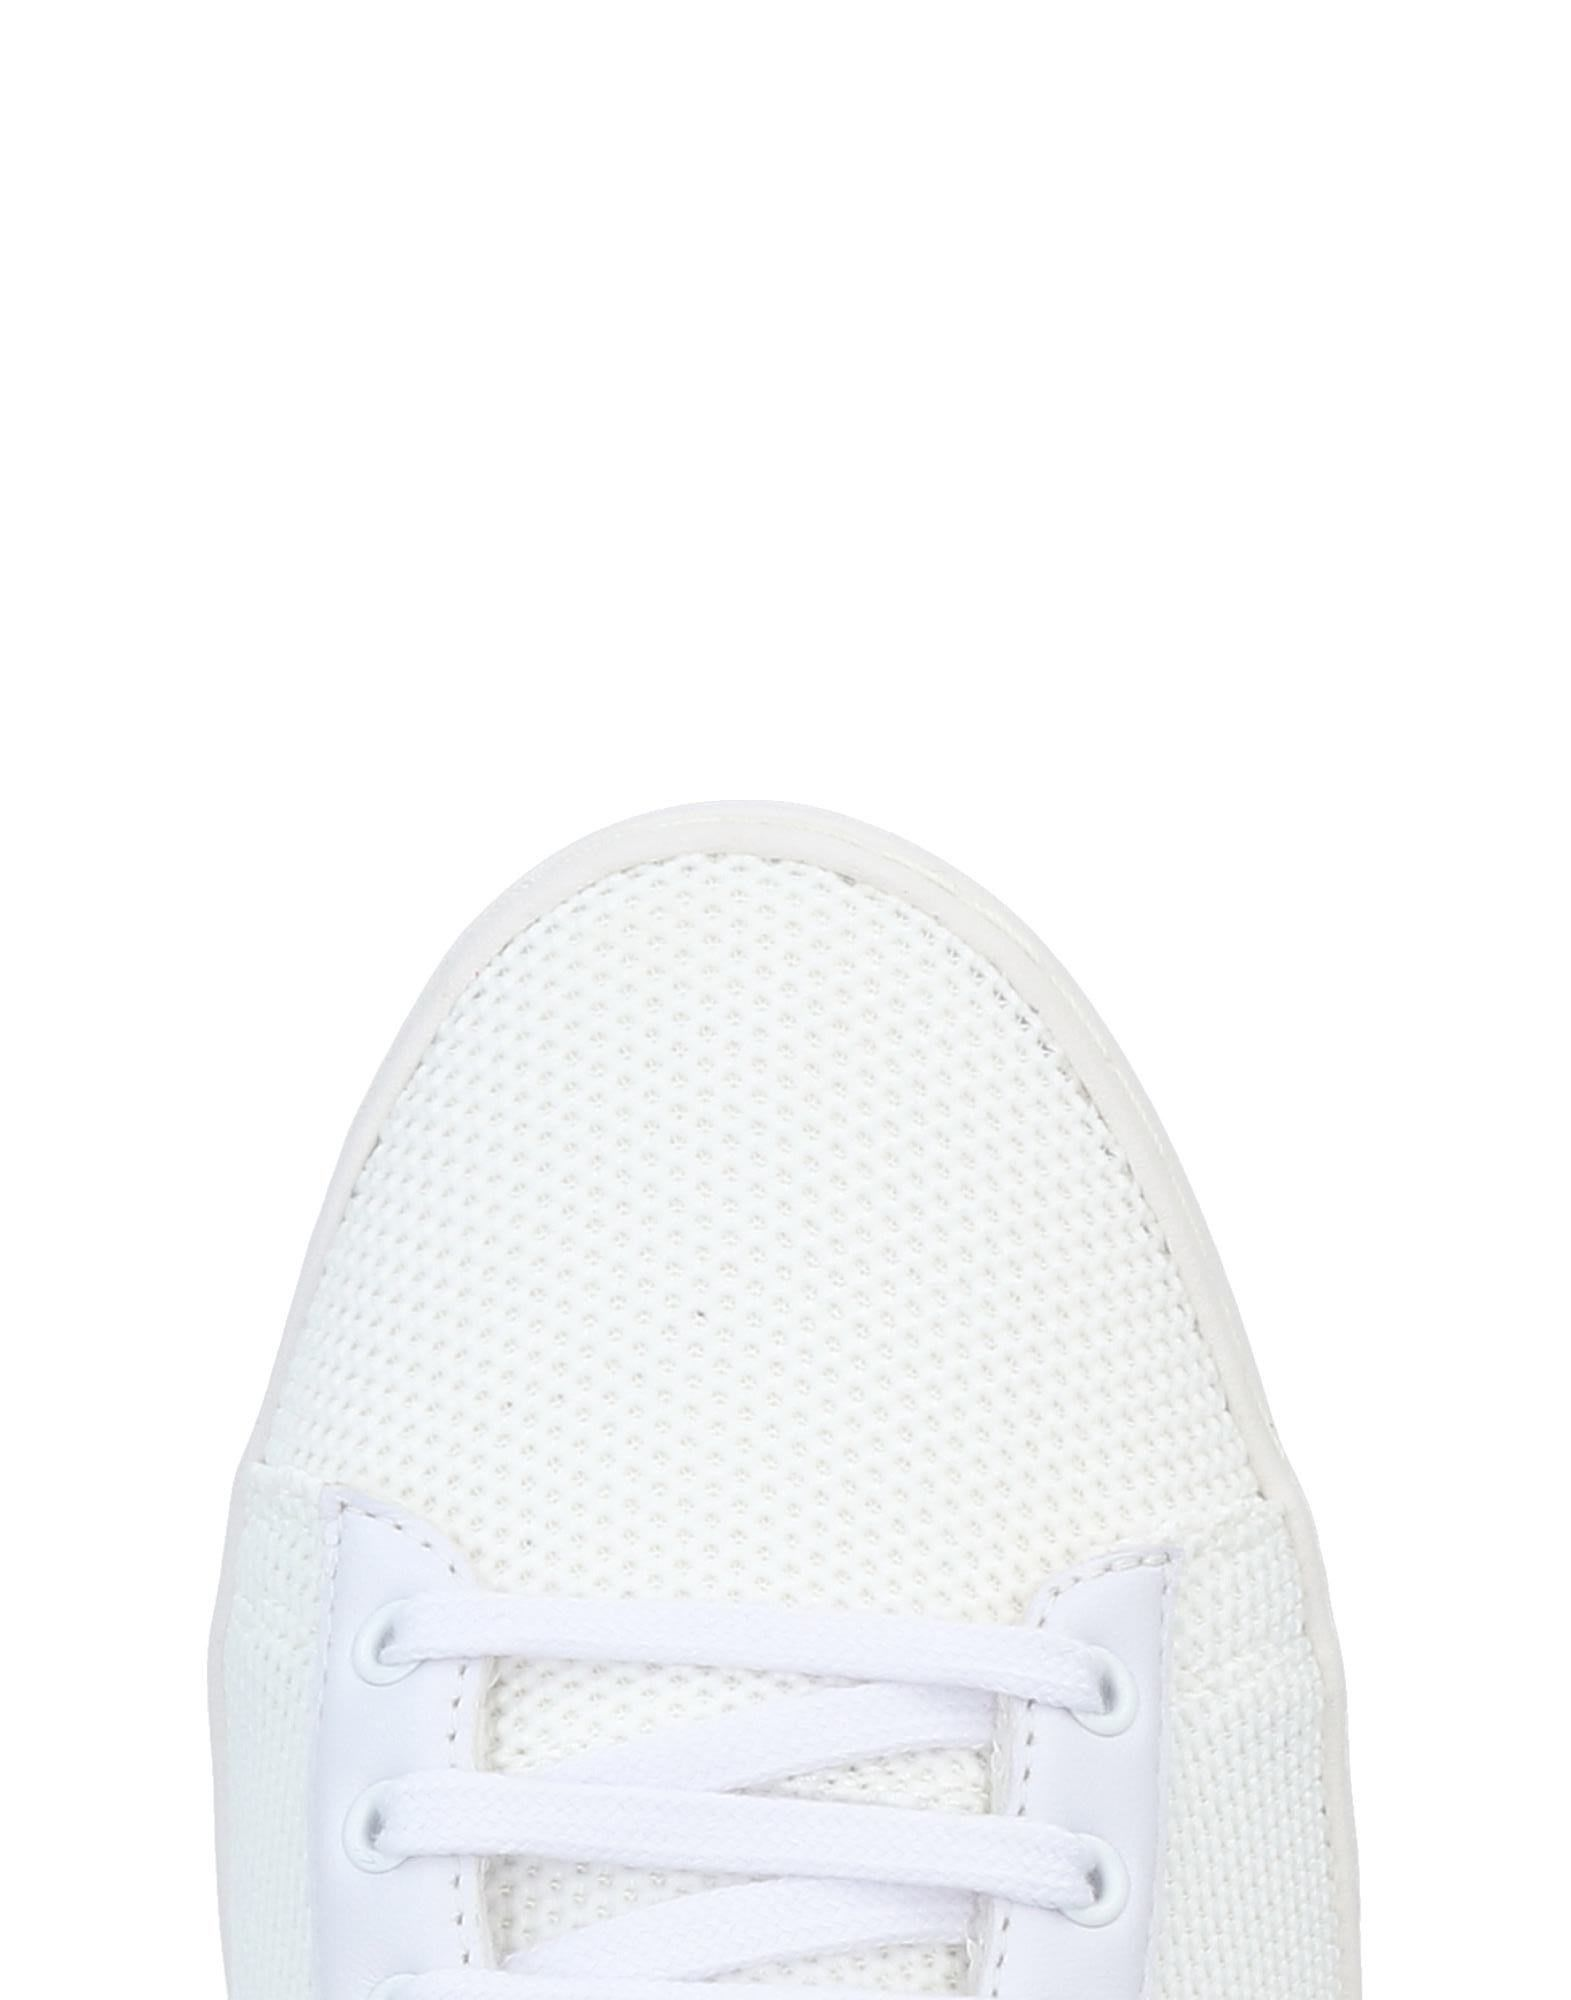 Fred Perry Sneakers Herren  11447719CV Neue Schuhe Schuhe Schuhe 809765